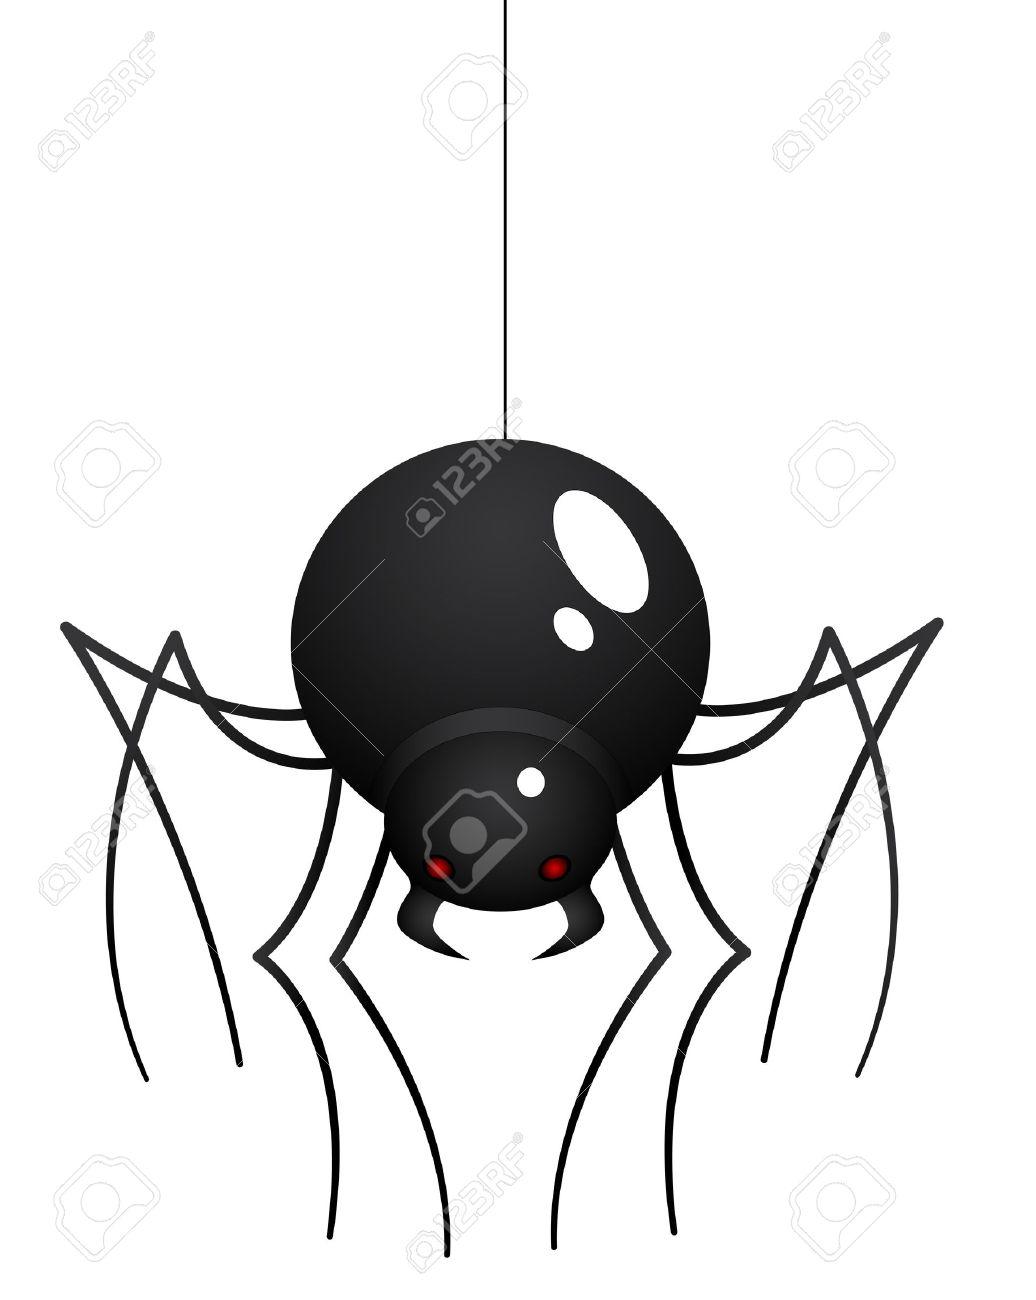 Cartoon Spider Stock Vector - 15759329